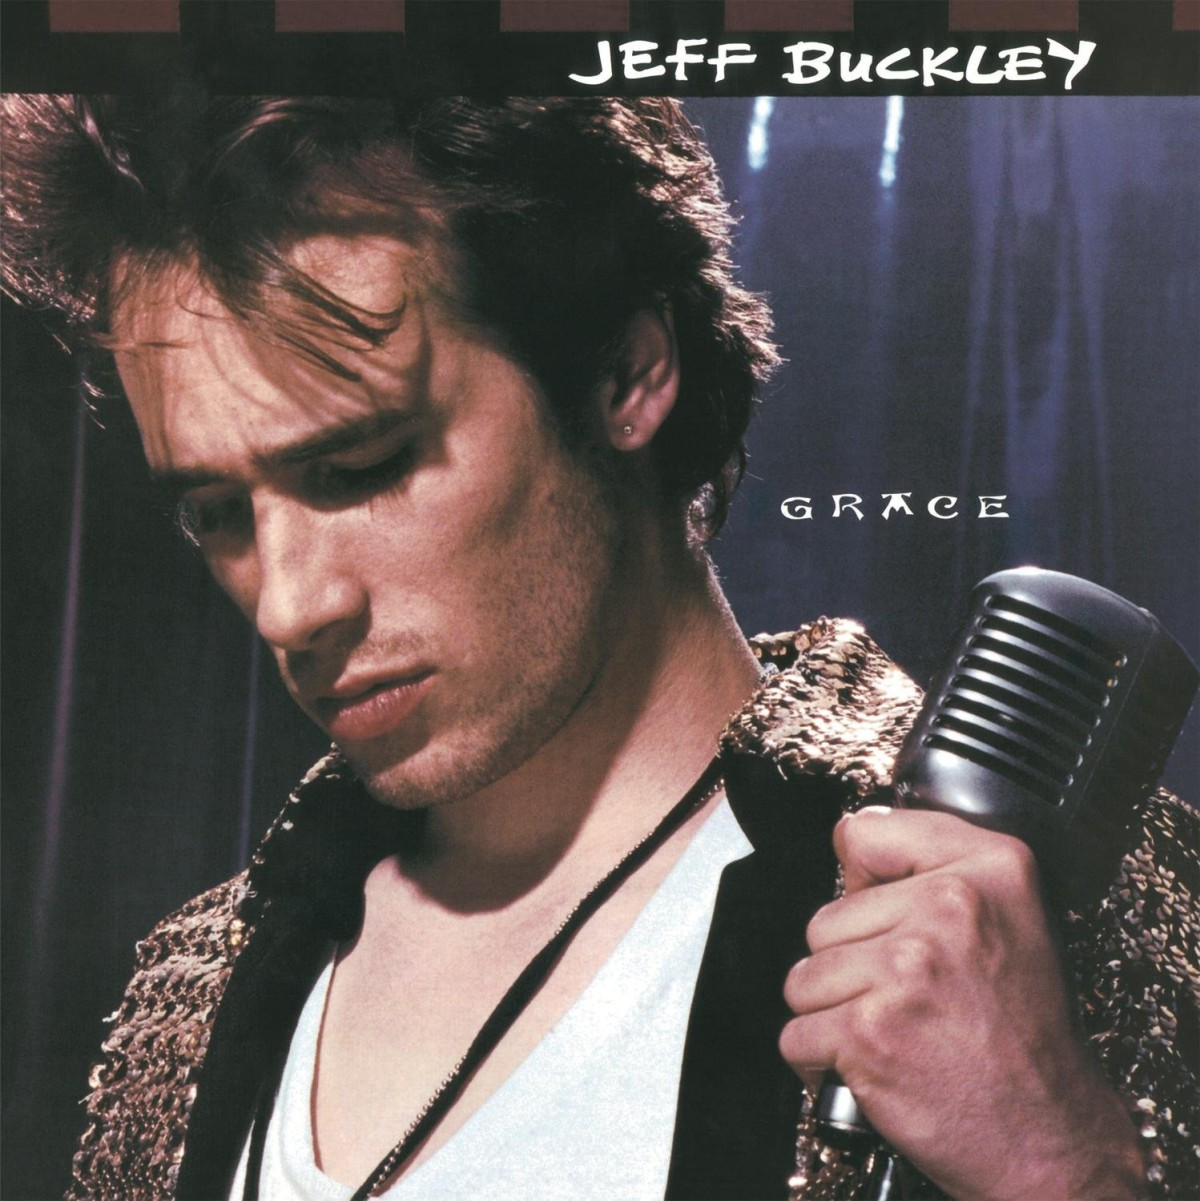 Jeff Buckley Grace review